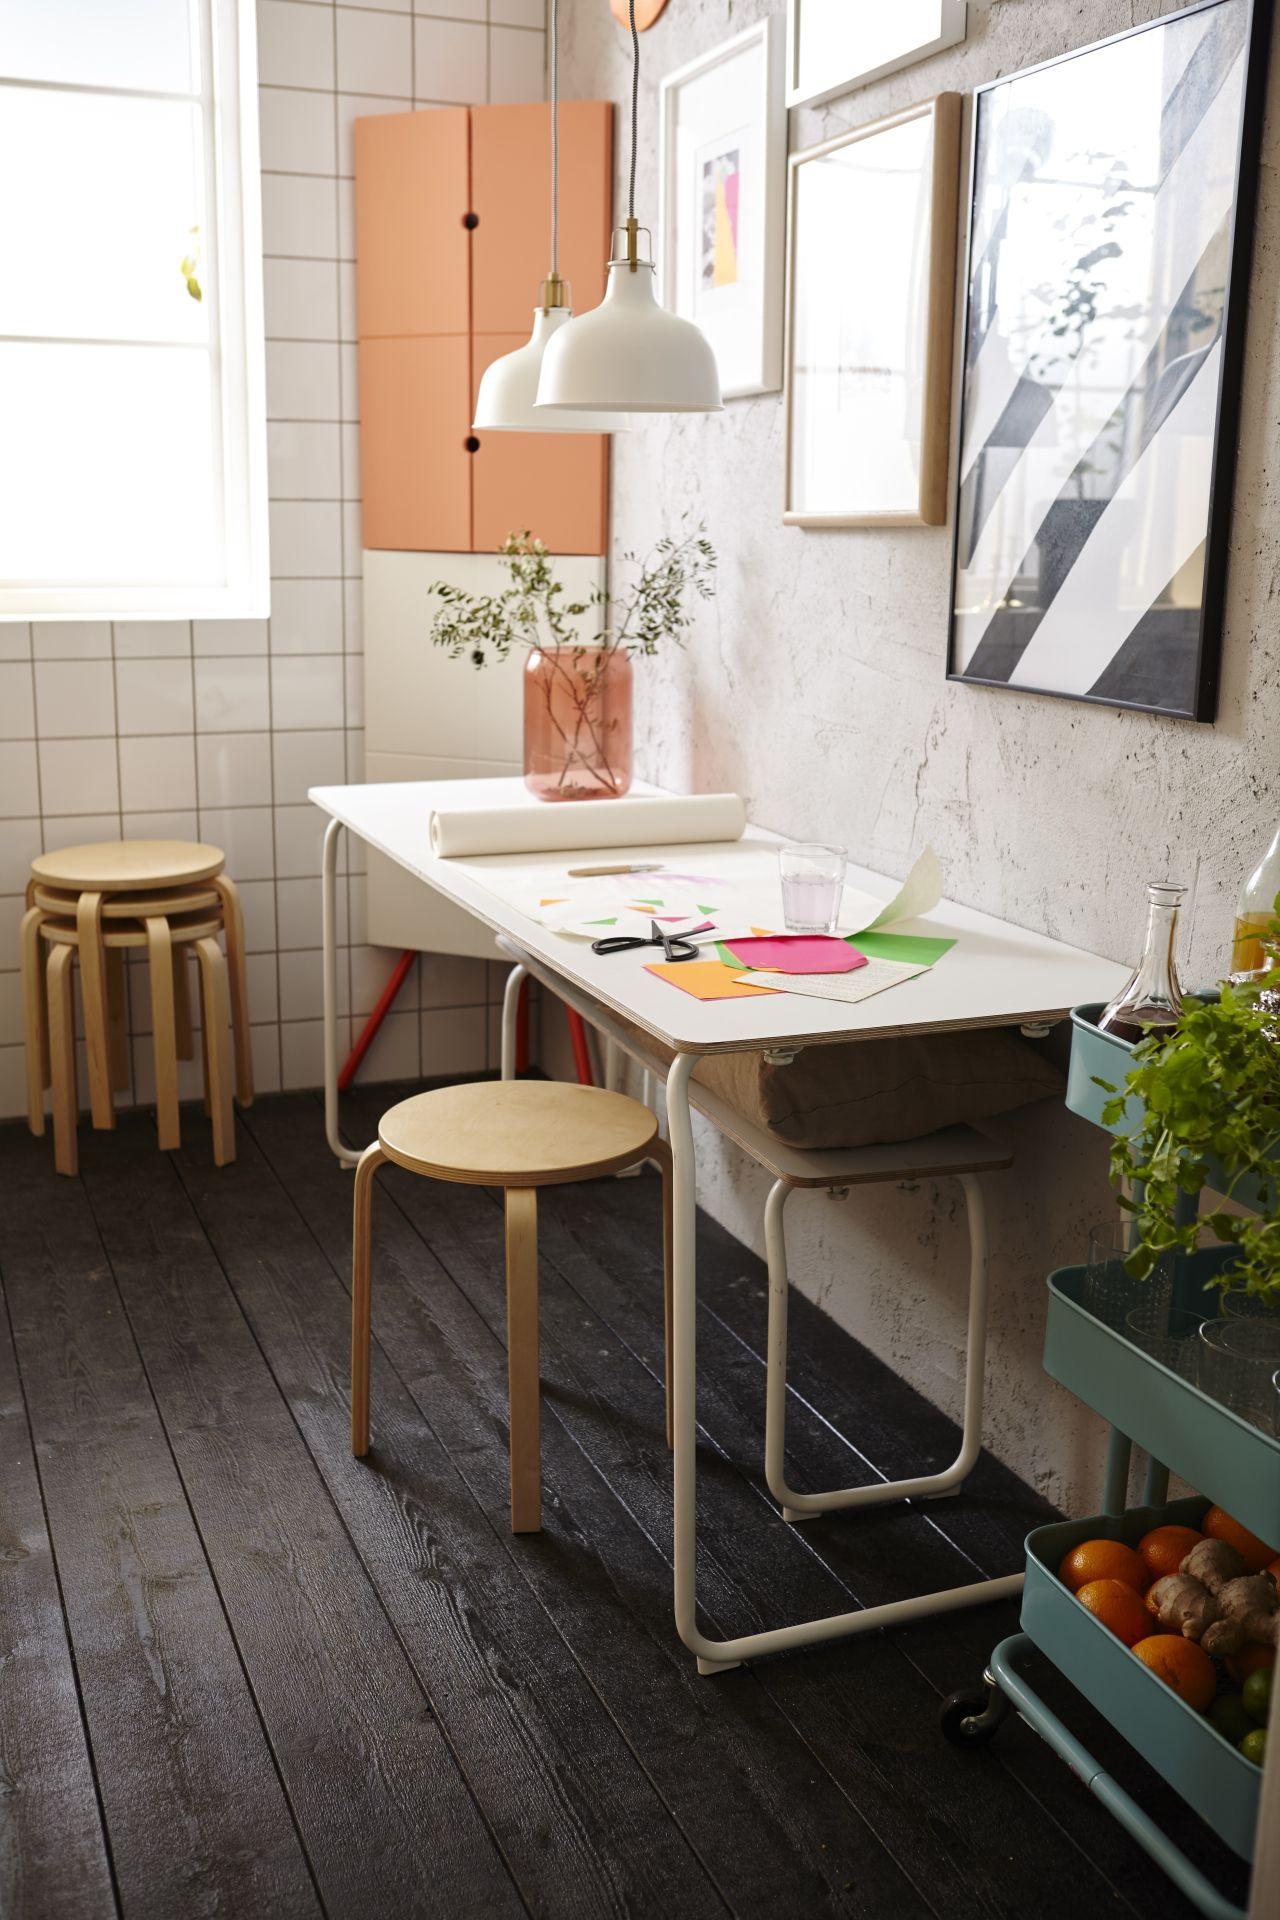 Do exterior no interior mesas cadeiras decora o - Mesas exterior ikea ...